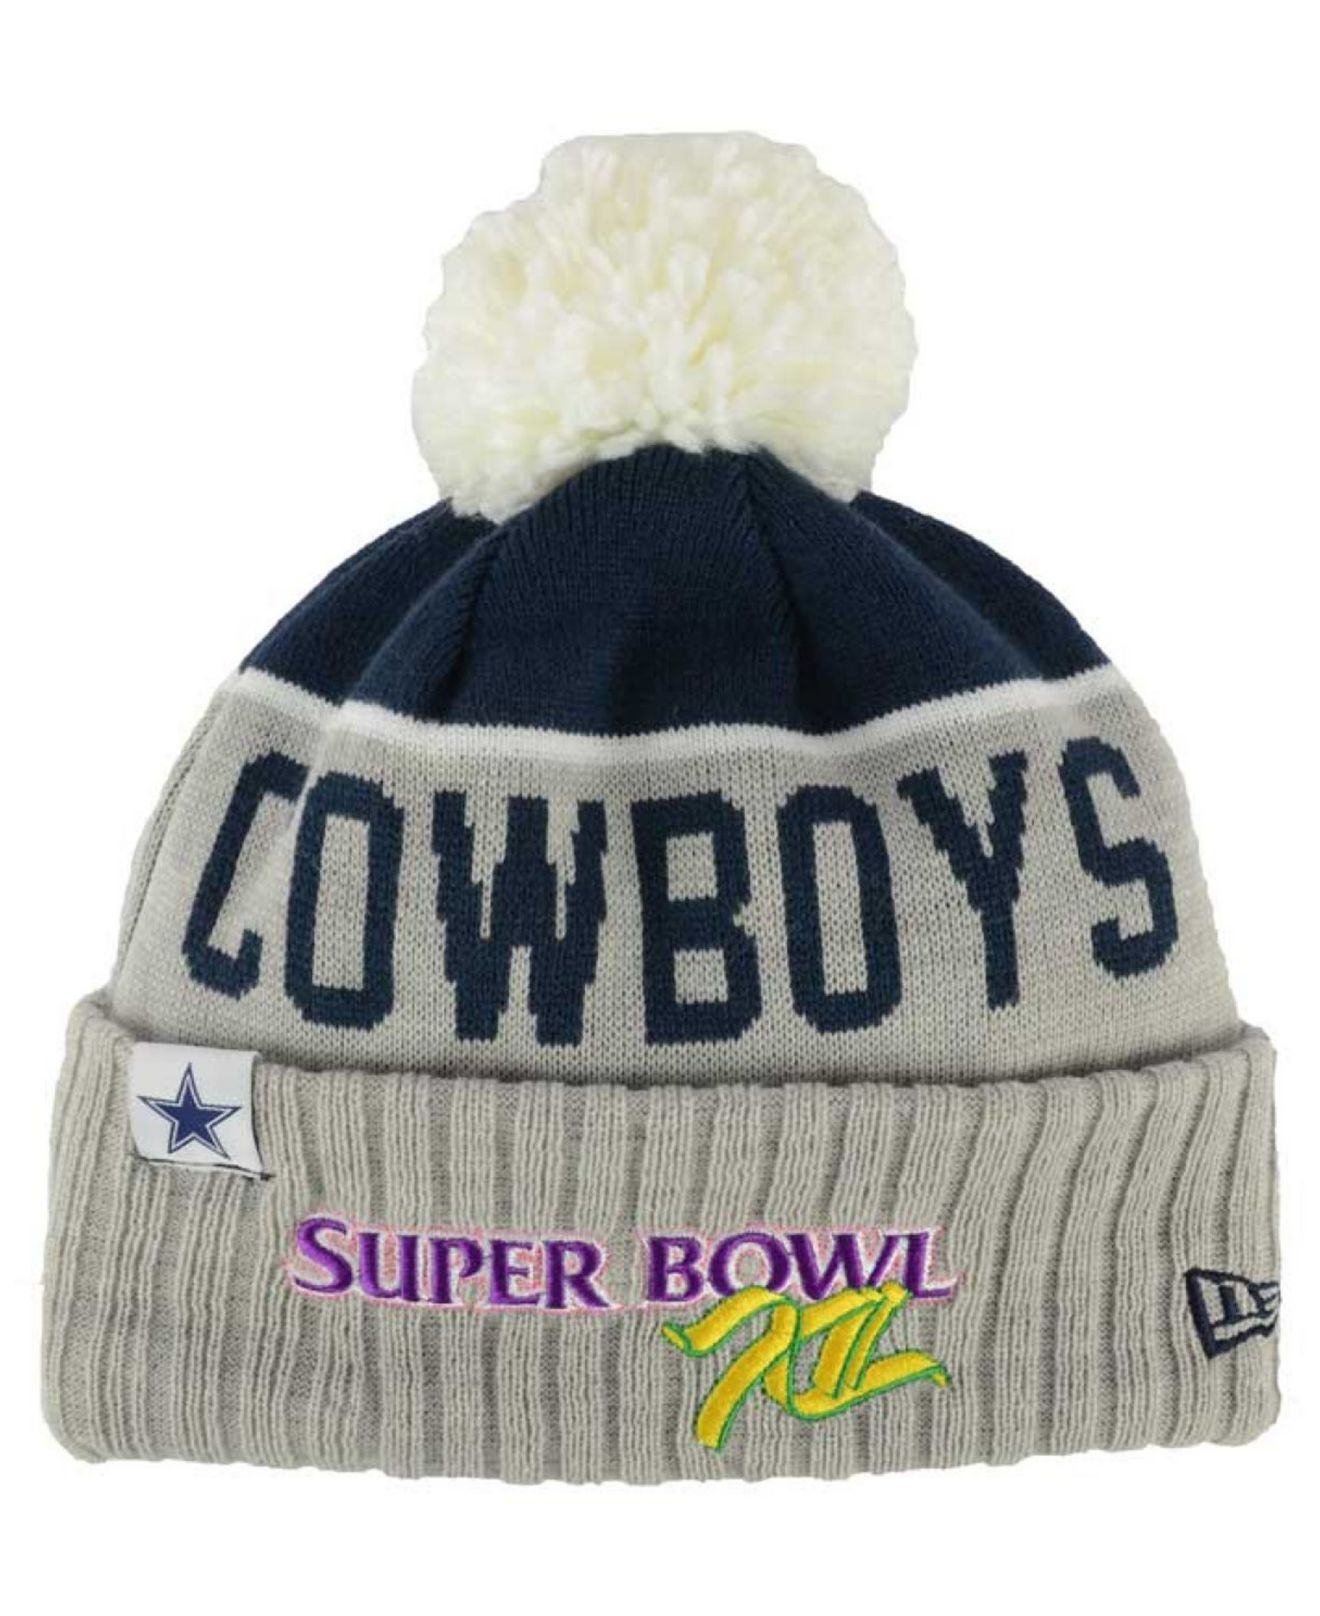 213fa565c8102c Lyst - KTZ Dallas Cowboys Super Bowl Sport Knit Hat in Gray for Men